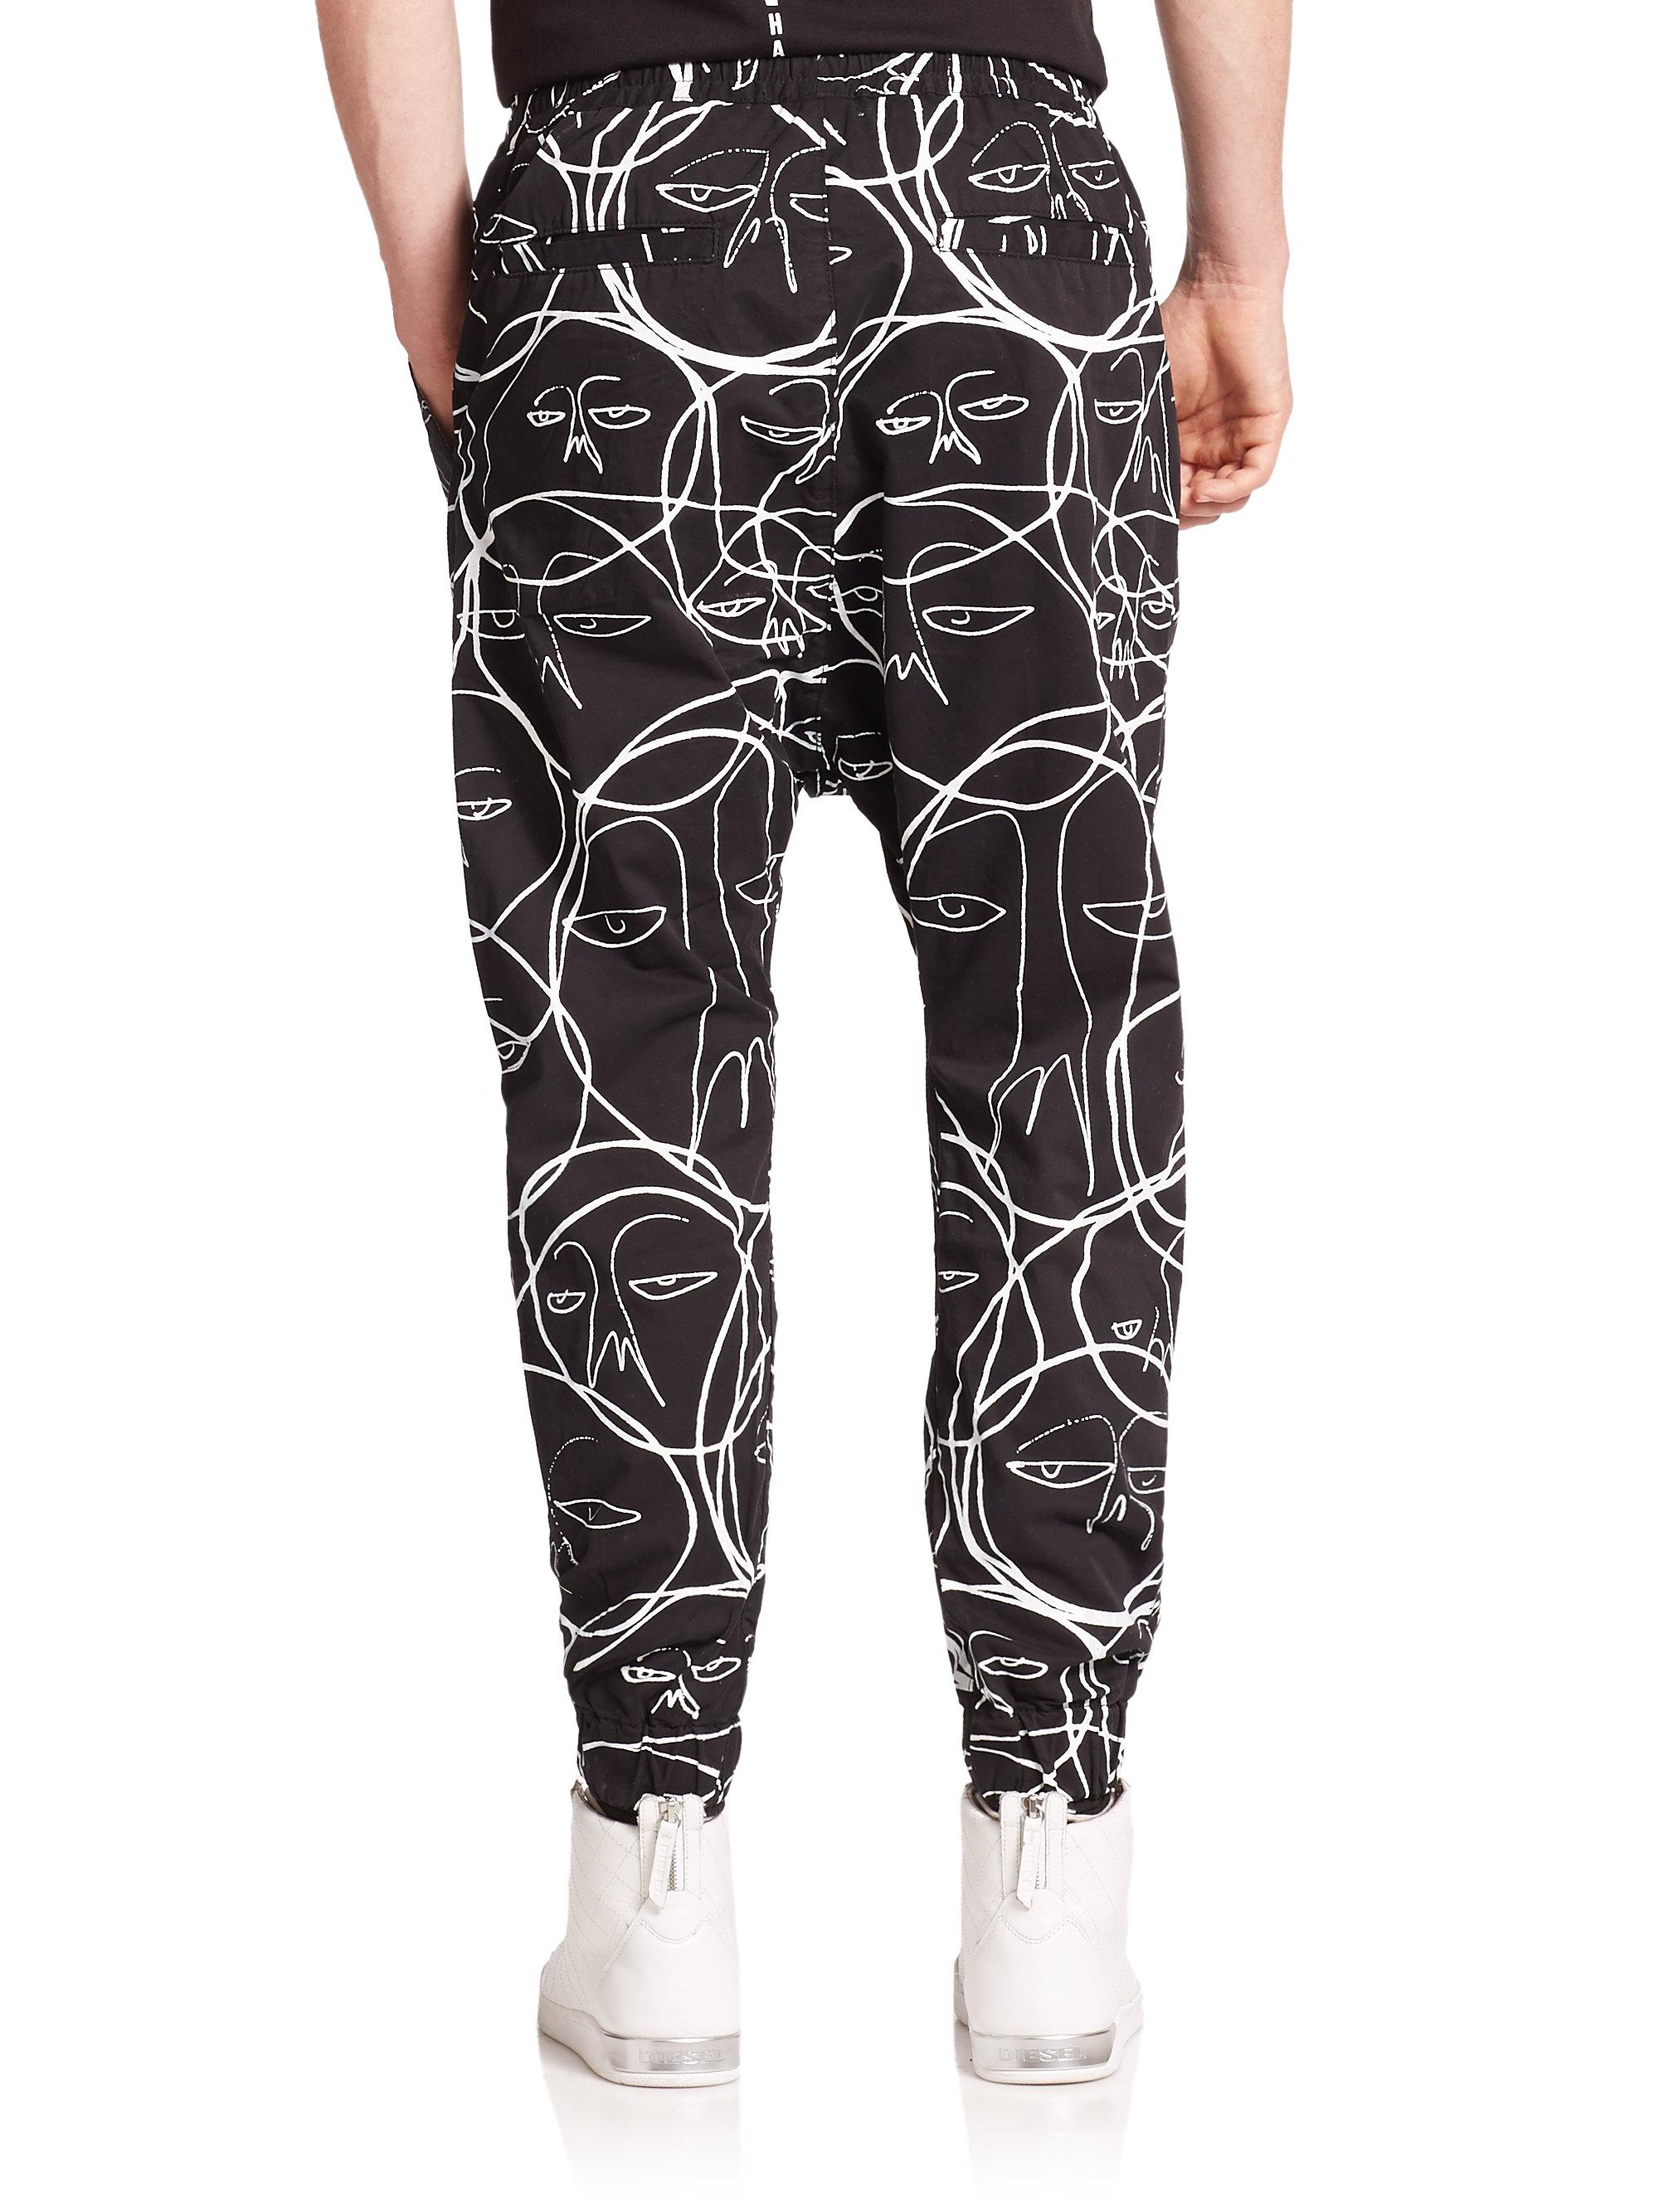 Lyst - Haculla One Of A Kind Harem Pants in Black for Men